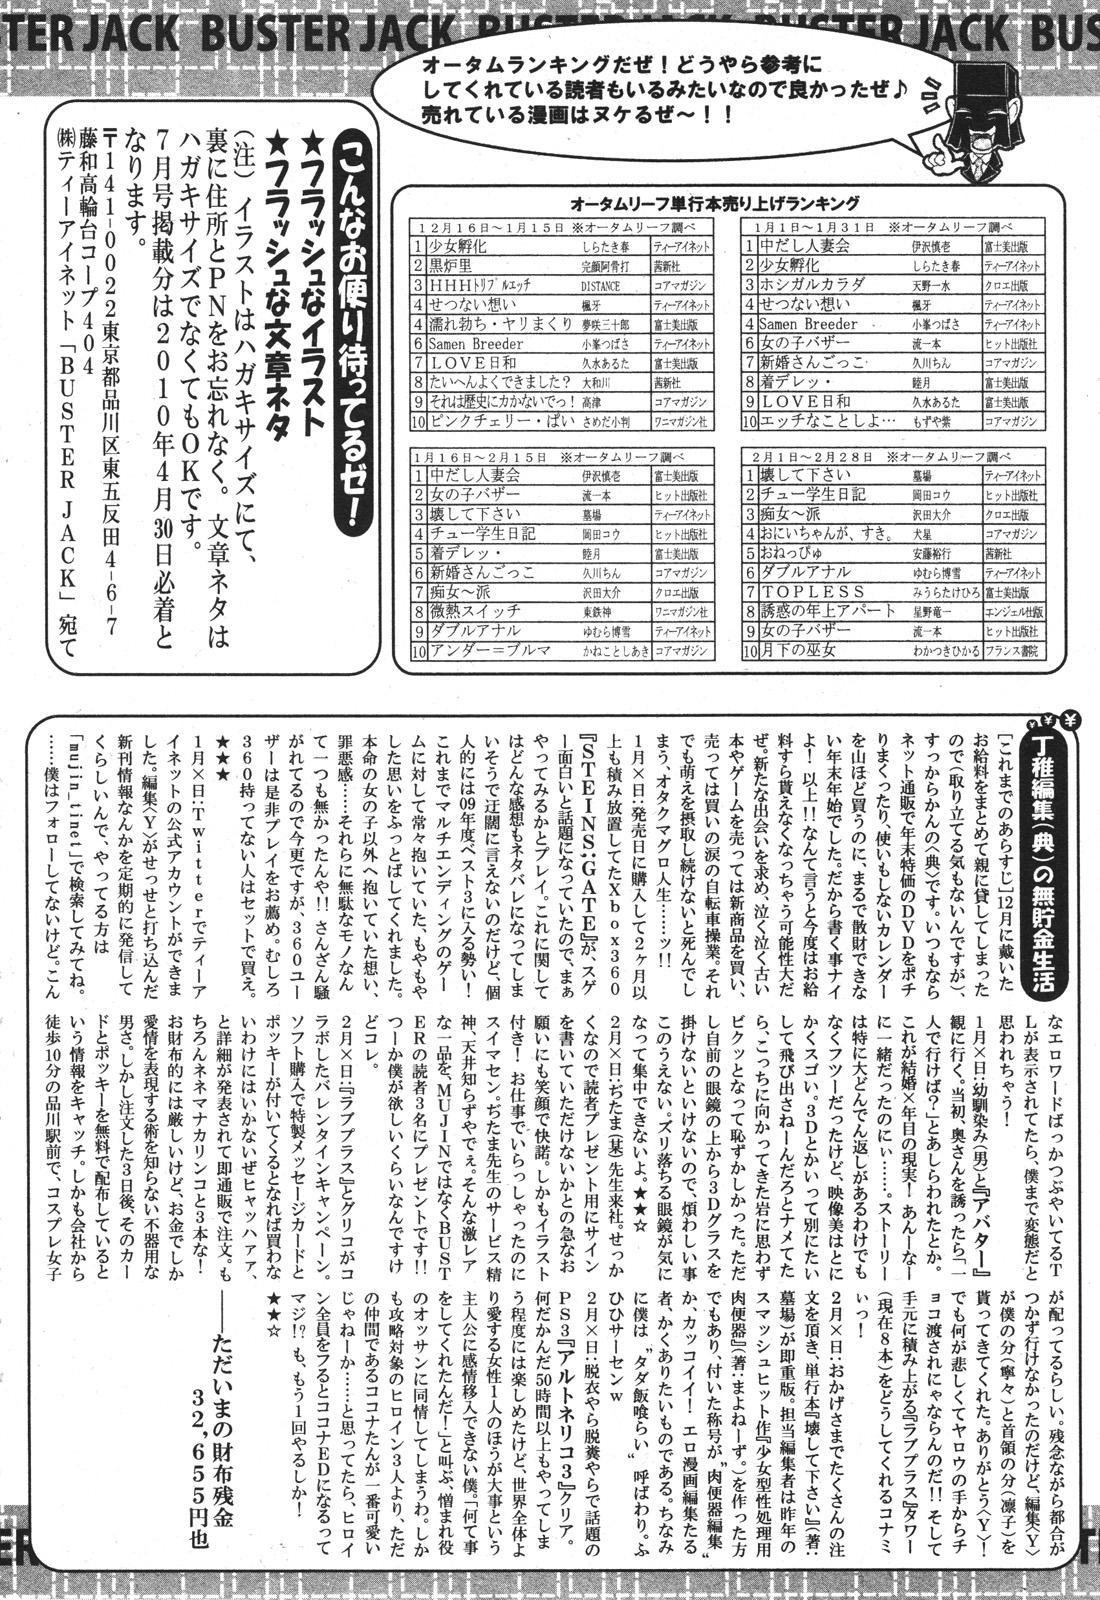 BUSTER COMIC 2010-05 Vol.07 482